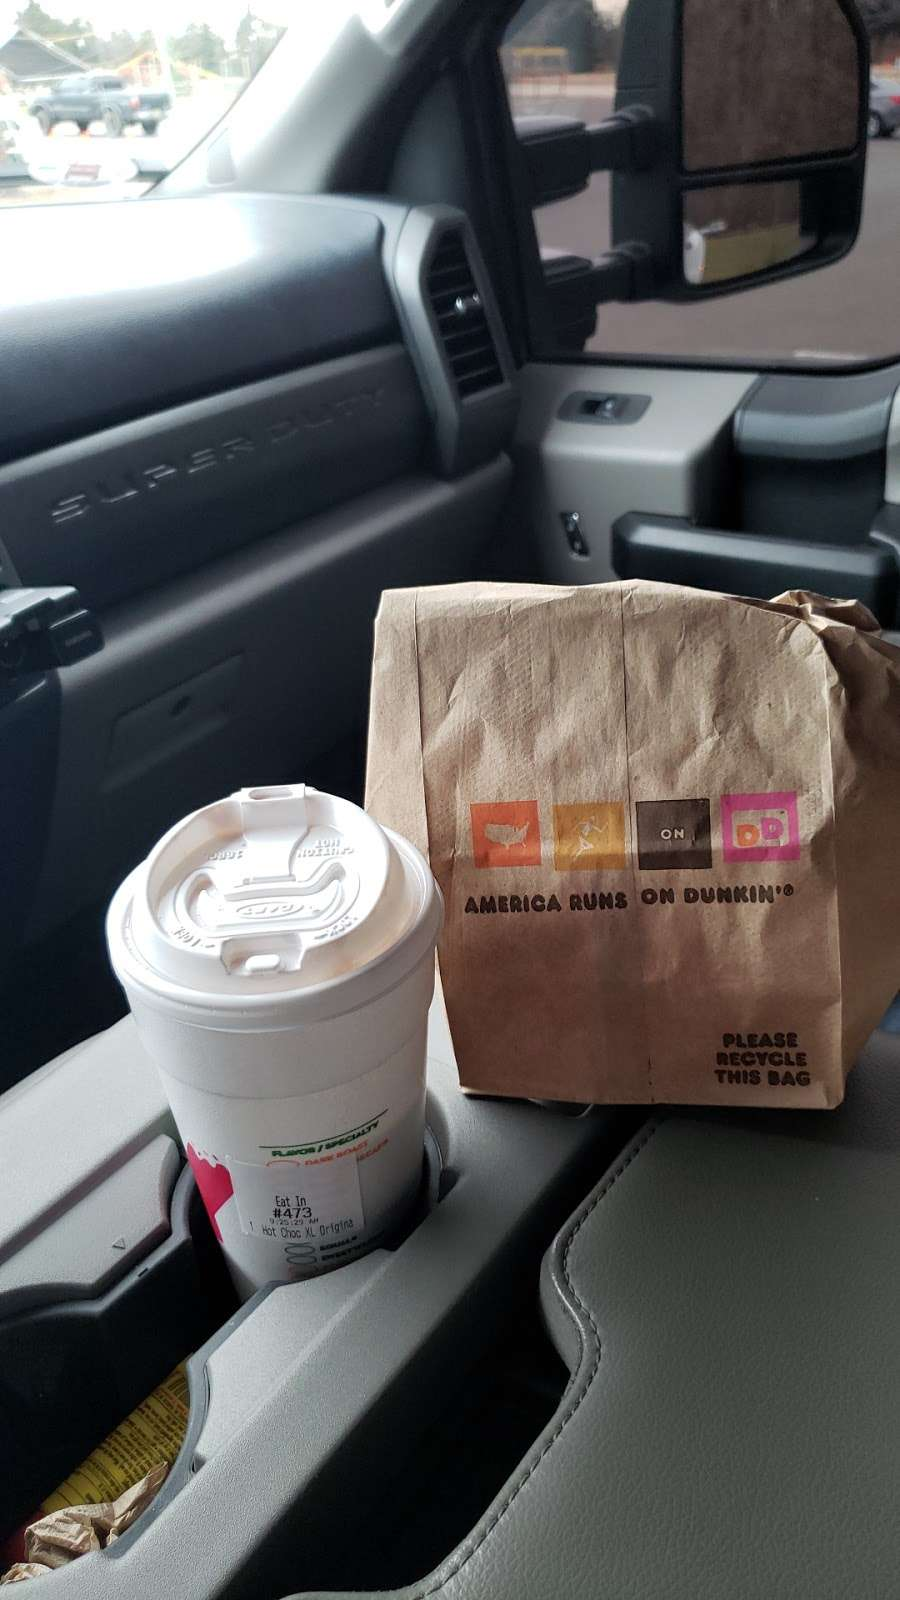 Dunkin Donuts - cafe    Photo 9 of 10   Address: 296 White Horse Pike, Atco, NJ 08004, USA   Phone: (856) 768-2233